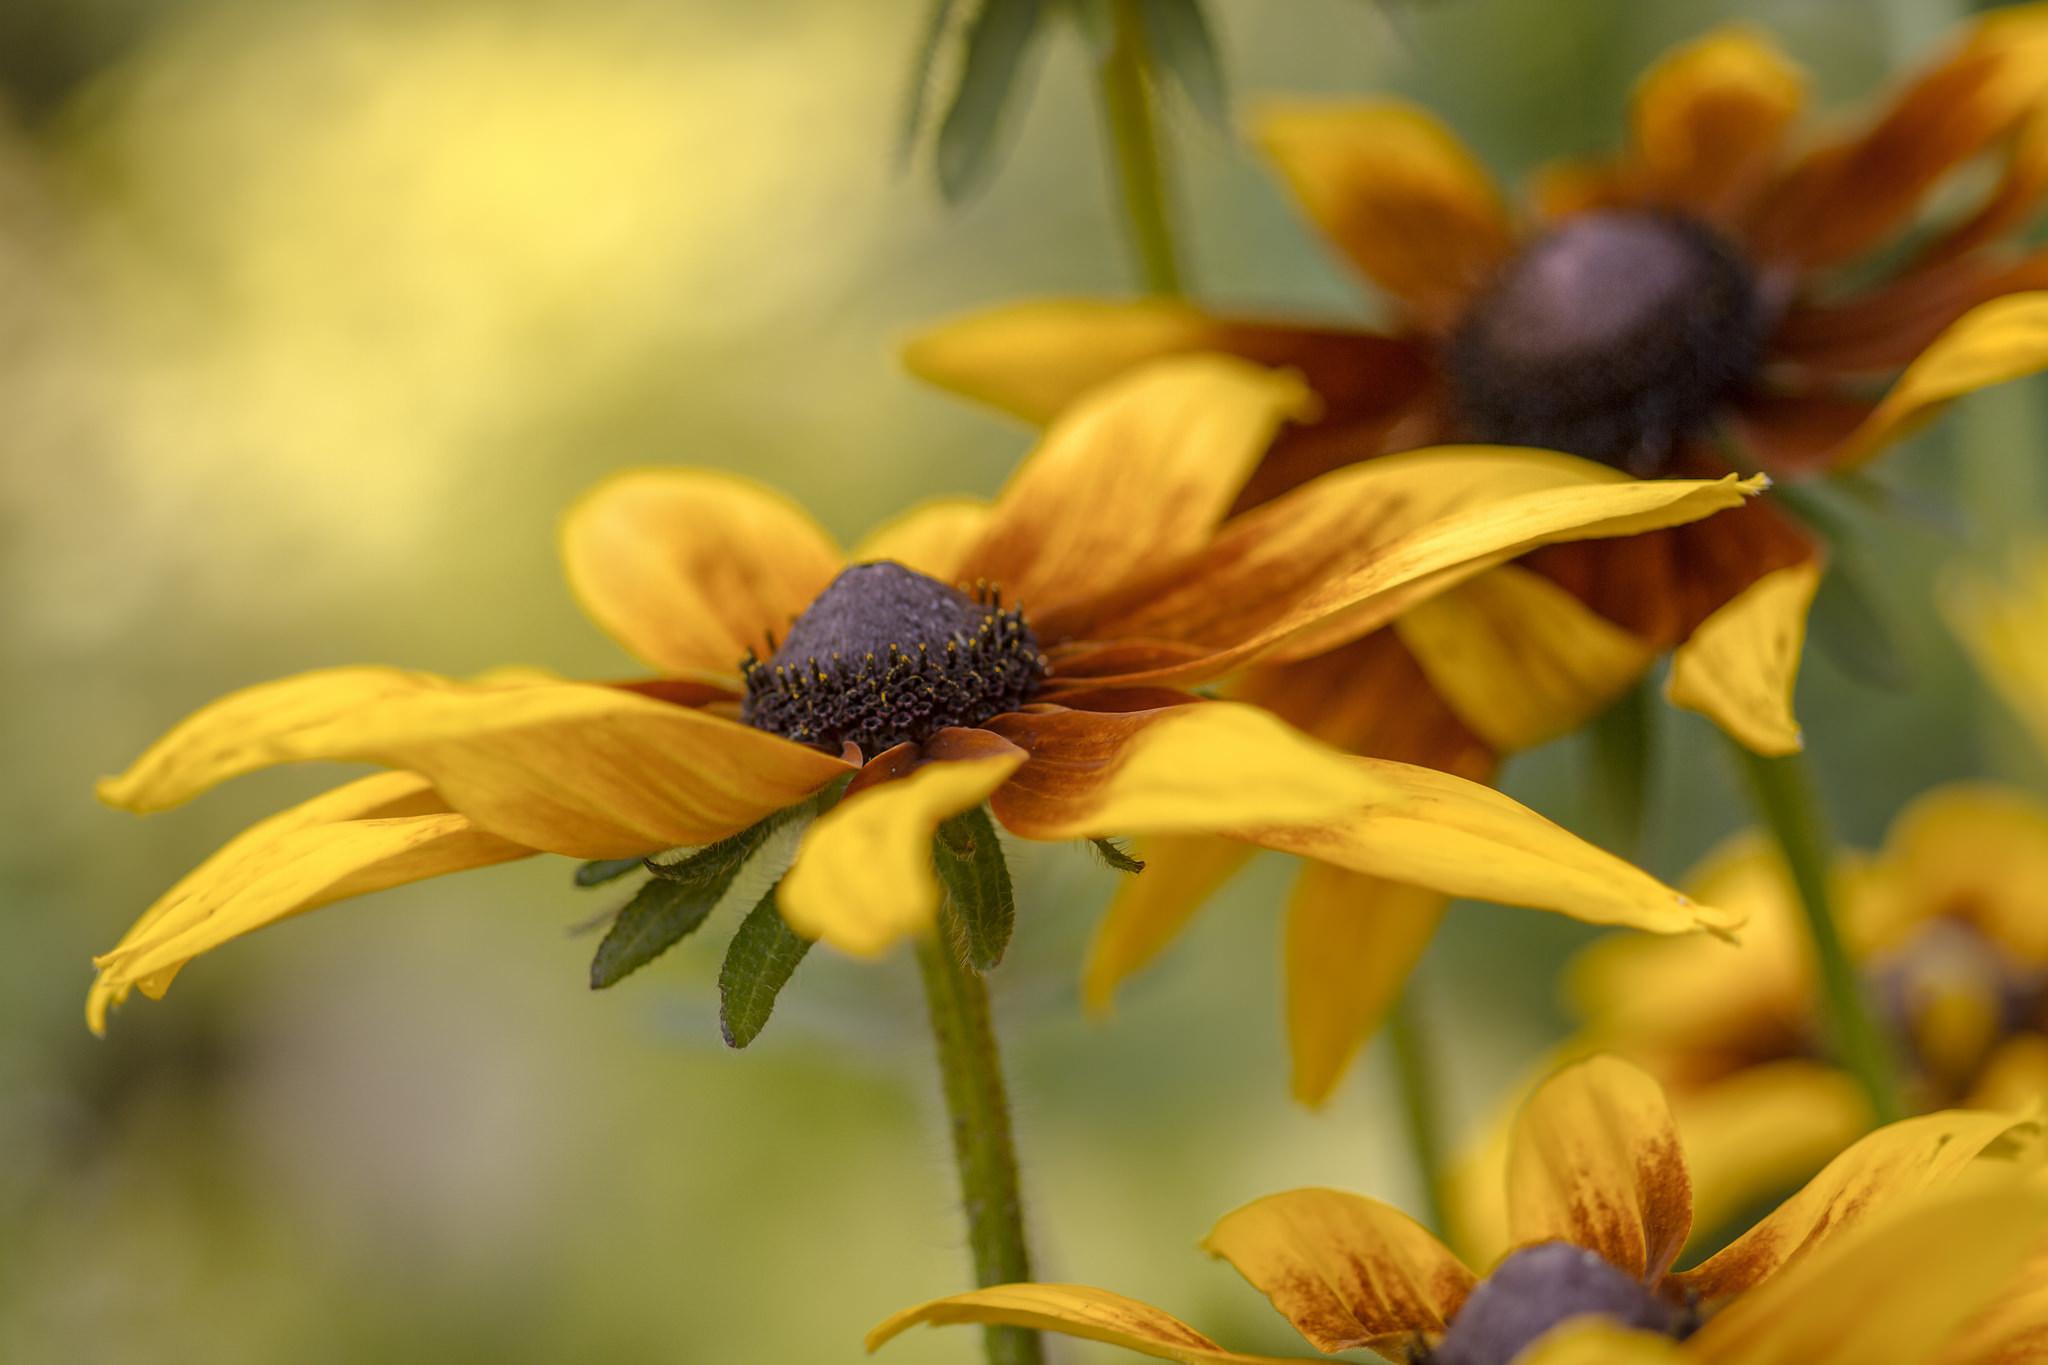 цветы макро желтые flowers macro yellow  № 910319 бесплатно